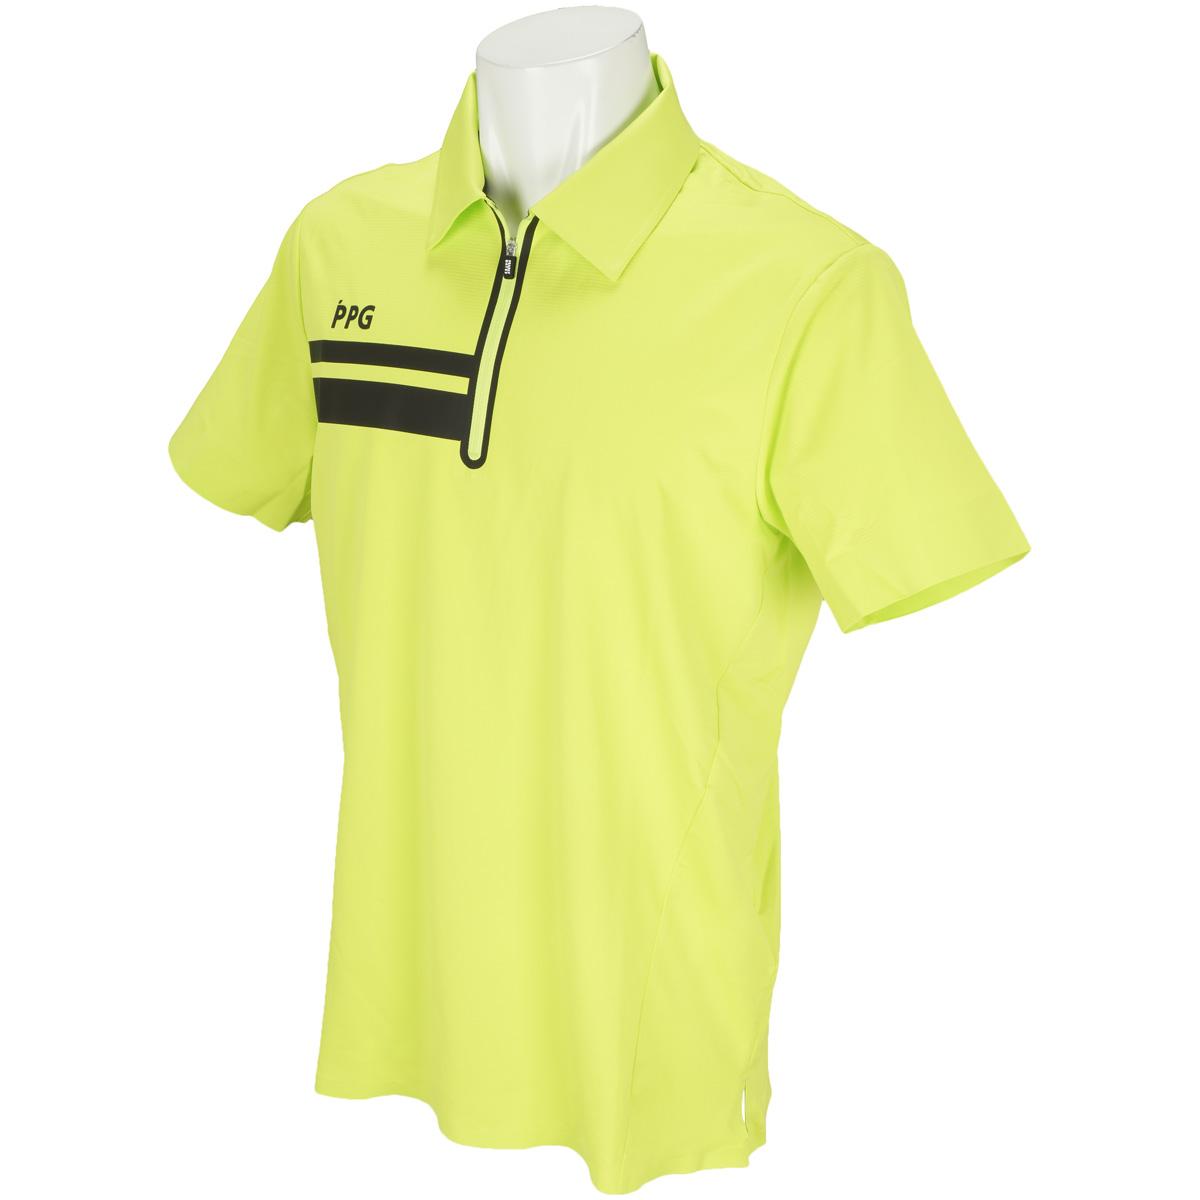 MSY布帛風ミニワッフル 半袖ポロシャツ